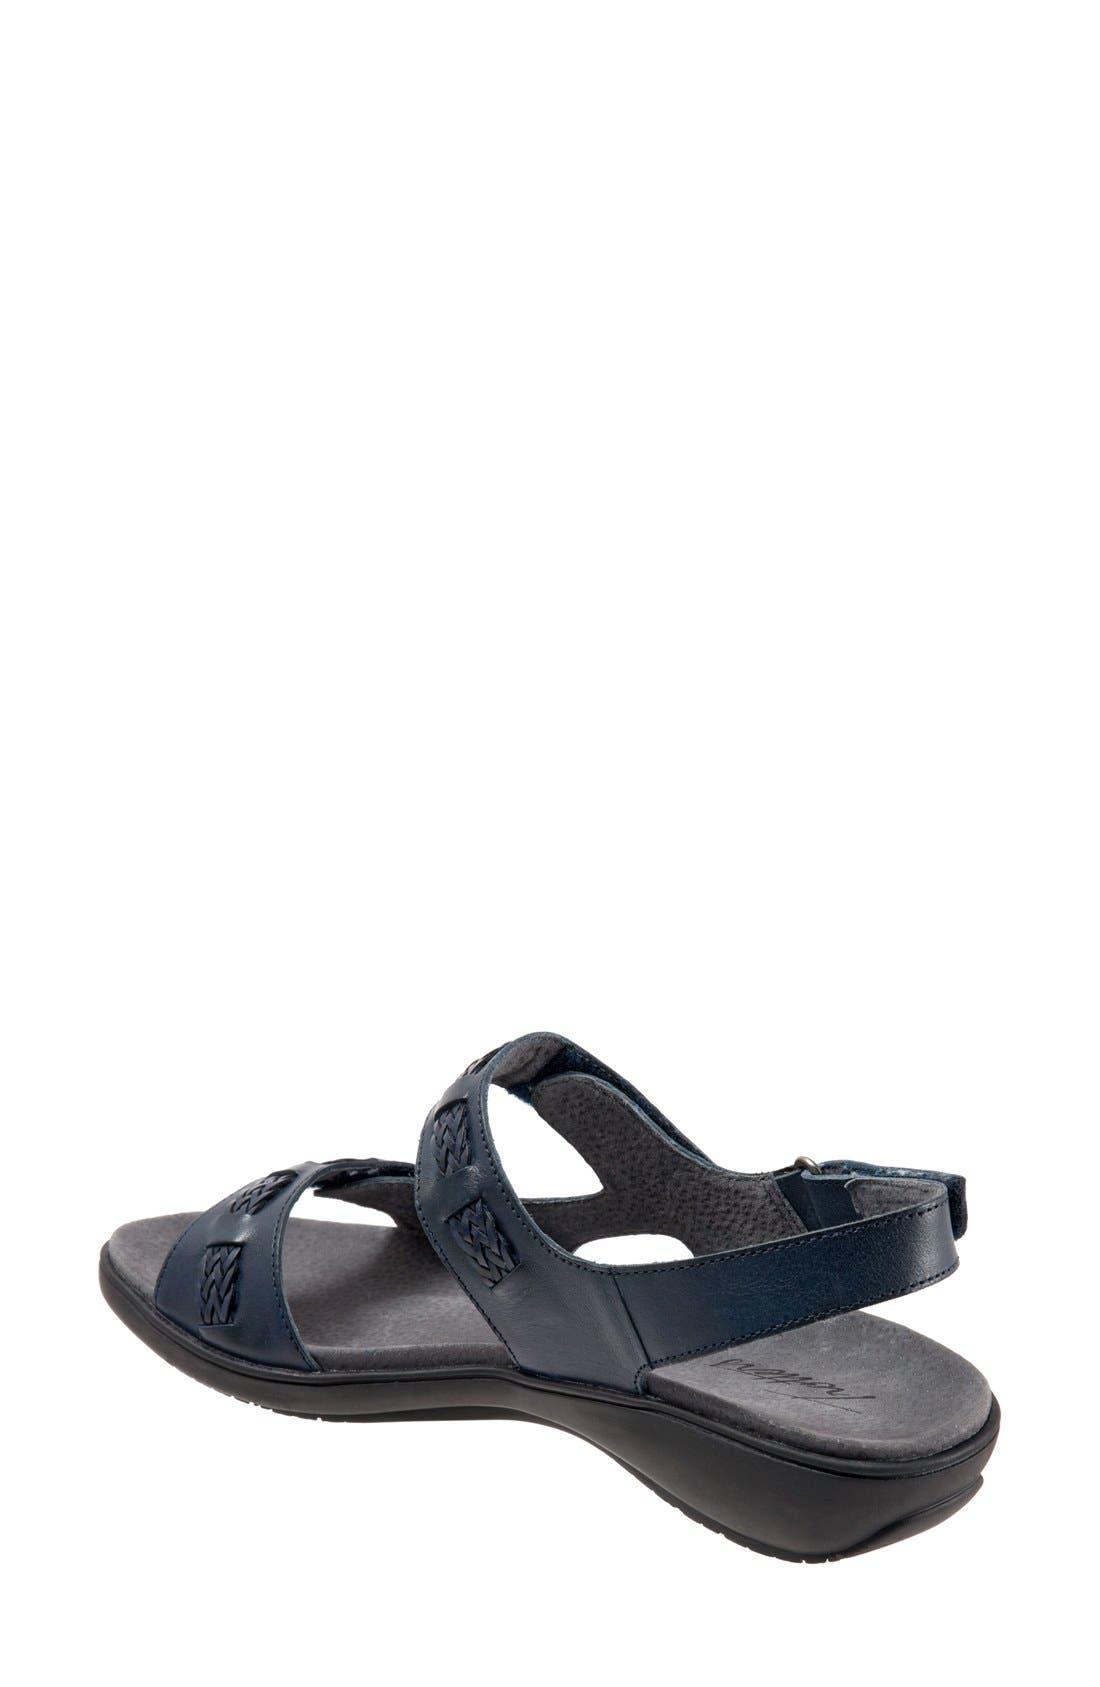 'Kip' Sandal,                             Alternate thumbnail 2, color,                             Navy Leather